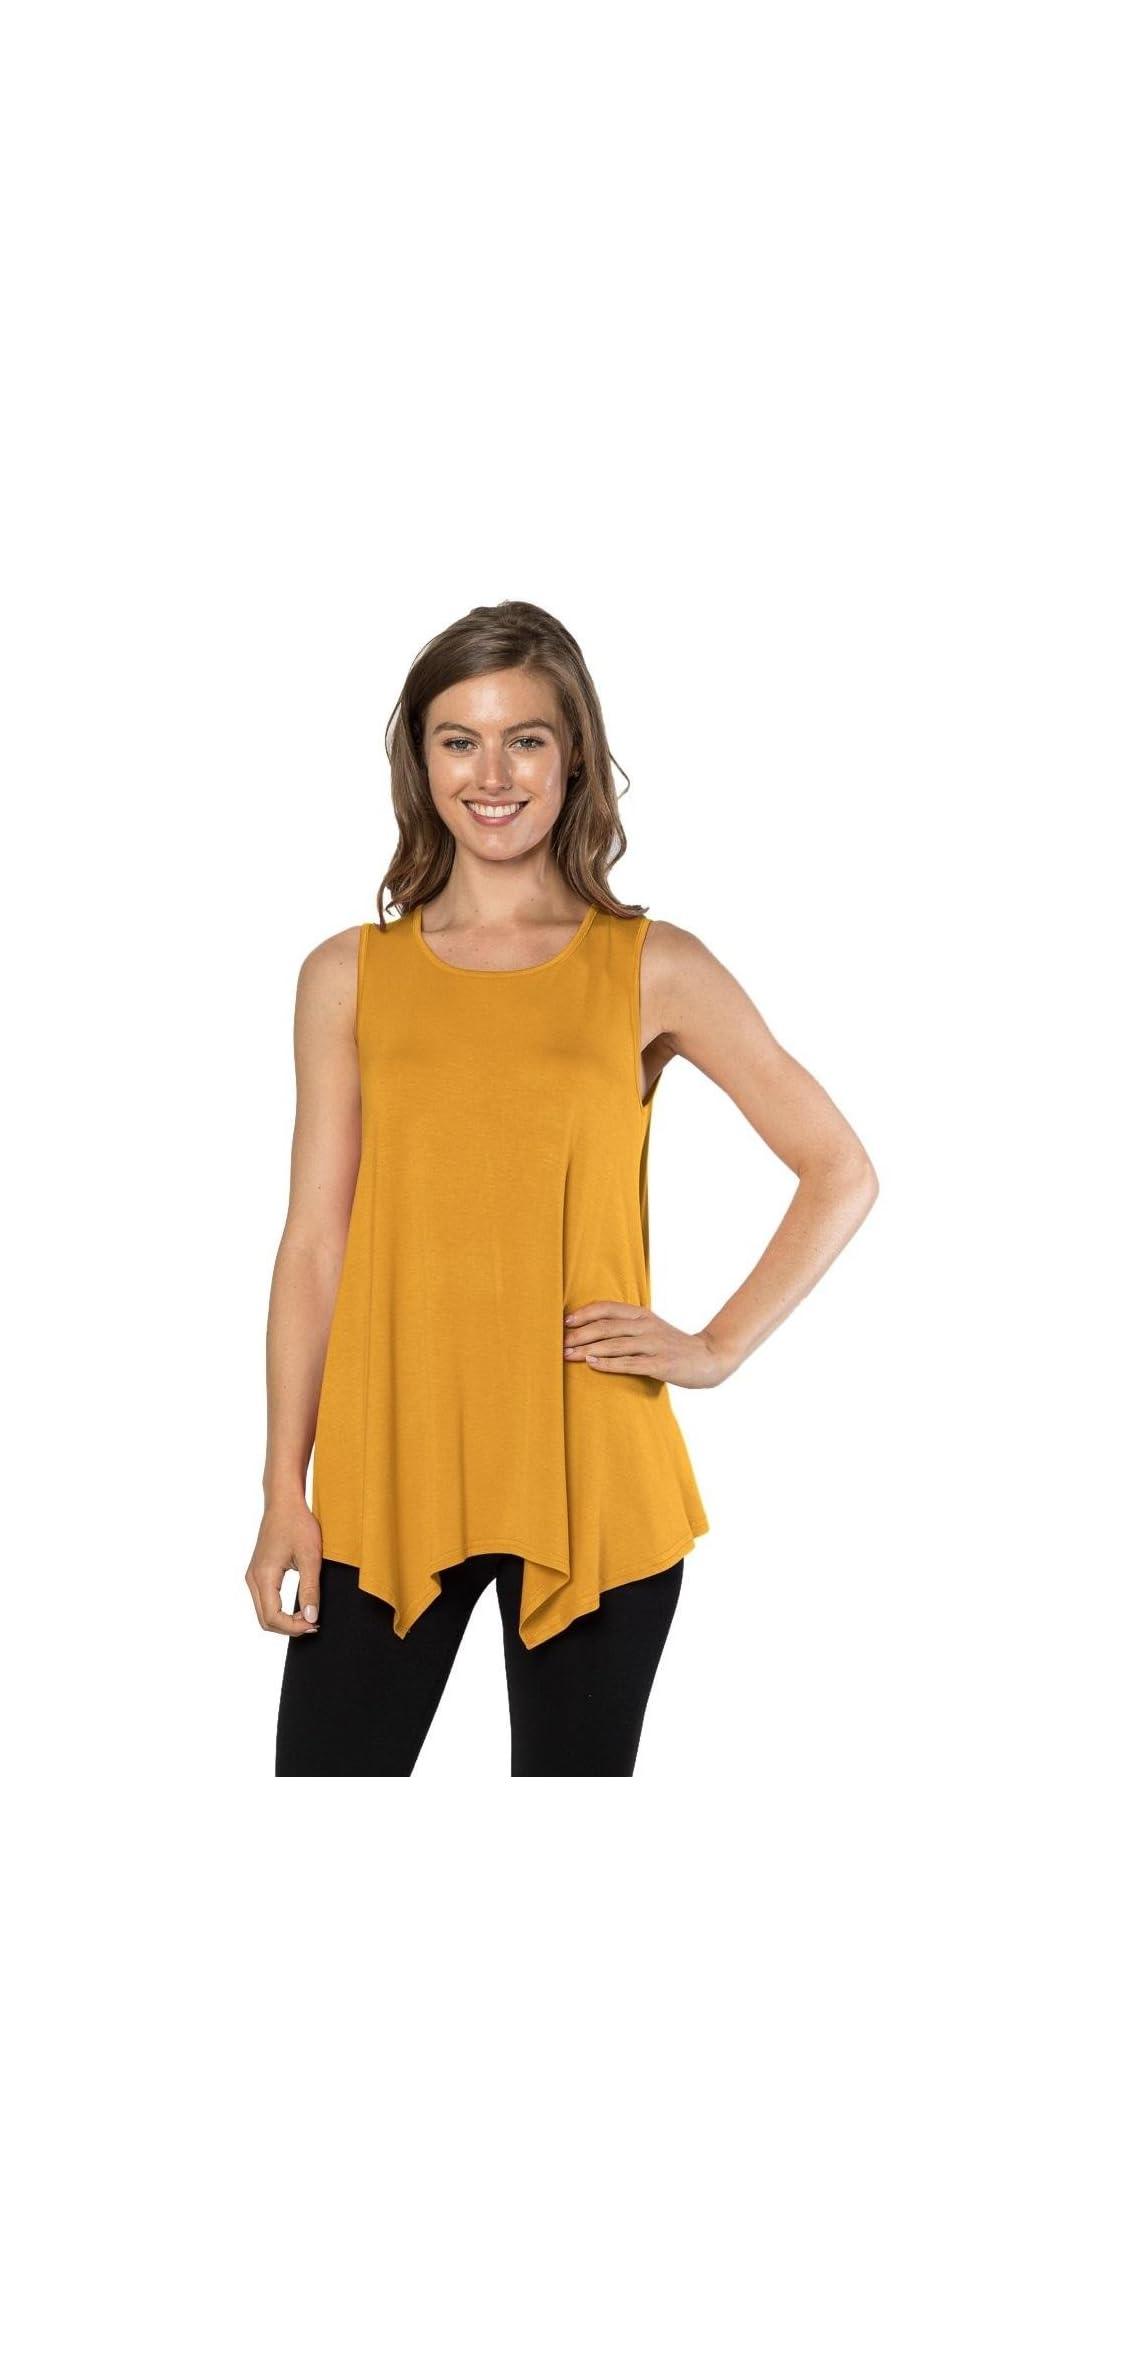 Womens Tunic Tank Top T-shirt - Loose Basic Sleeveless